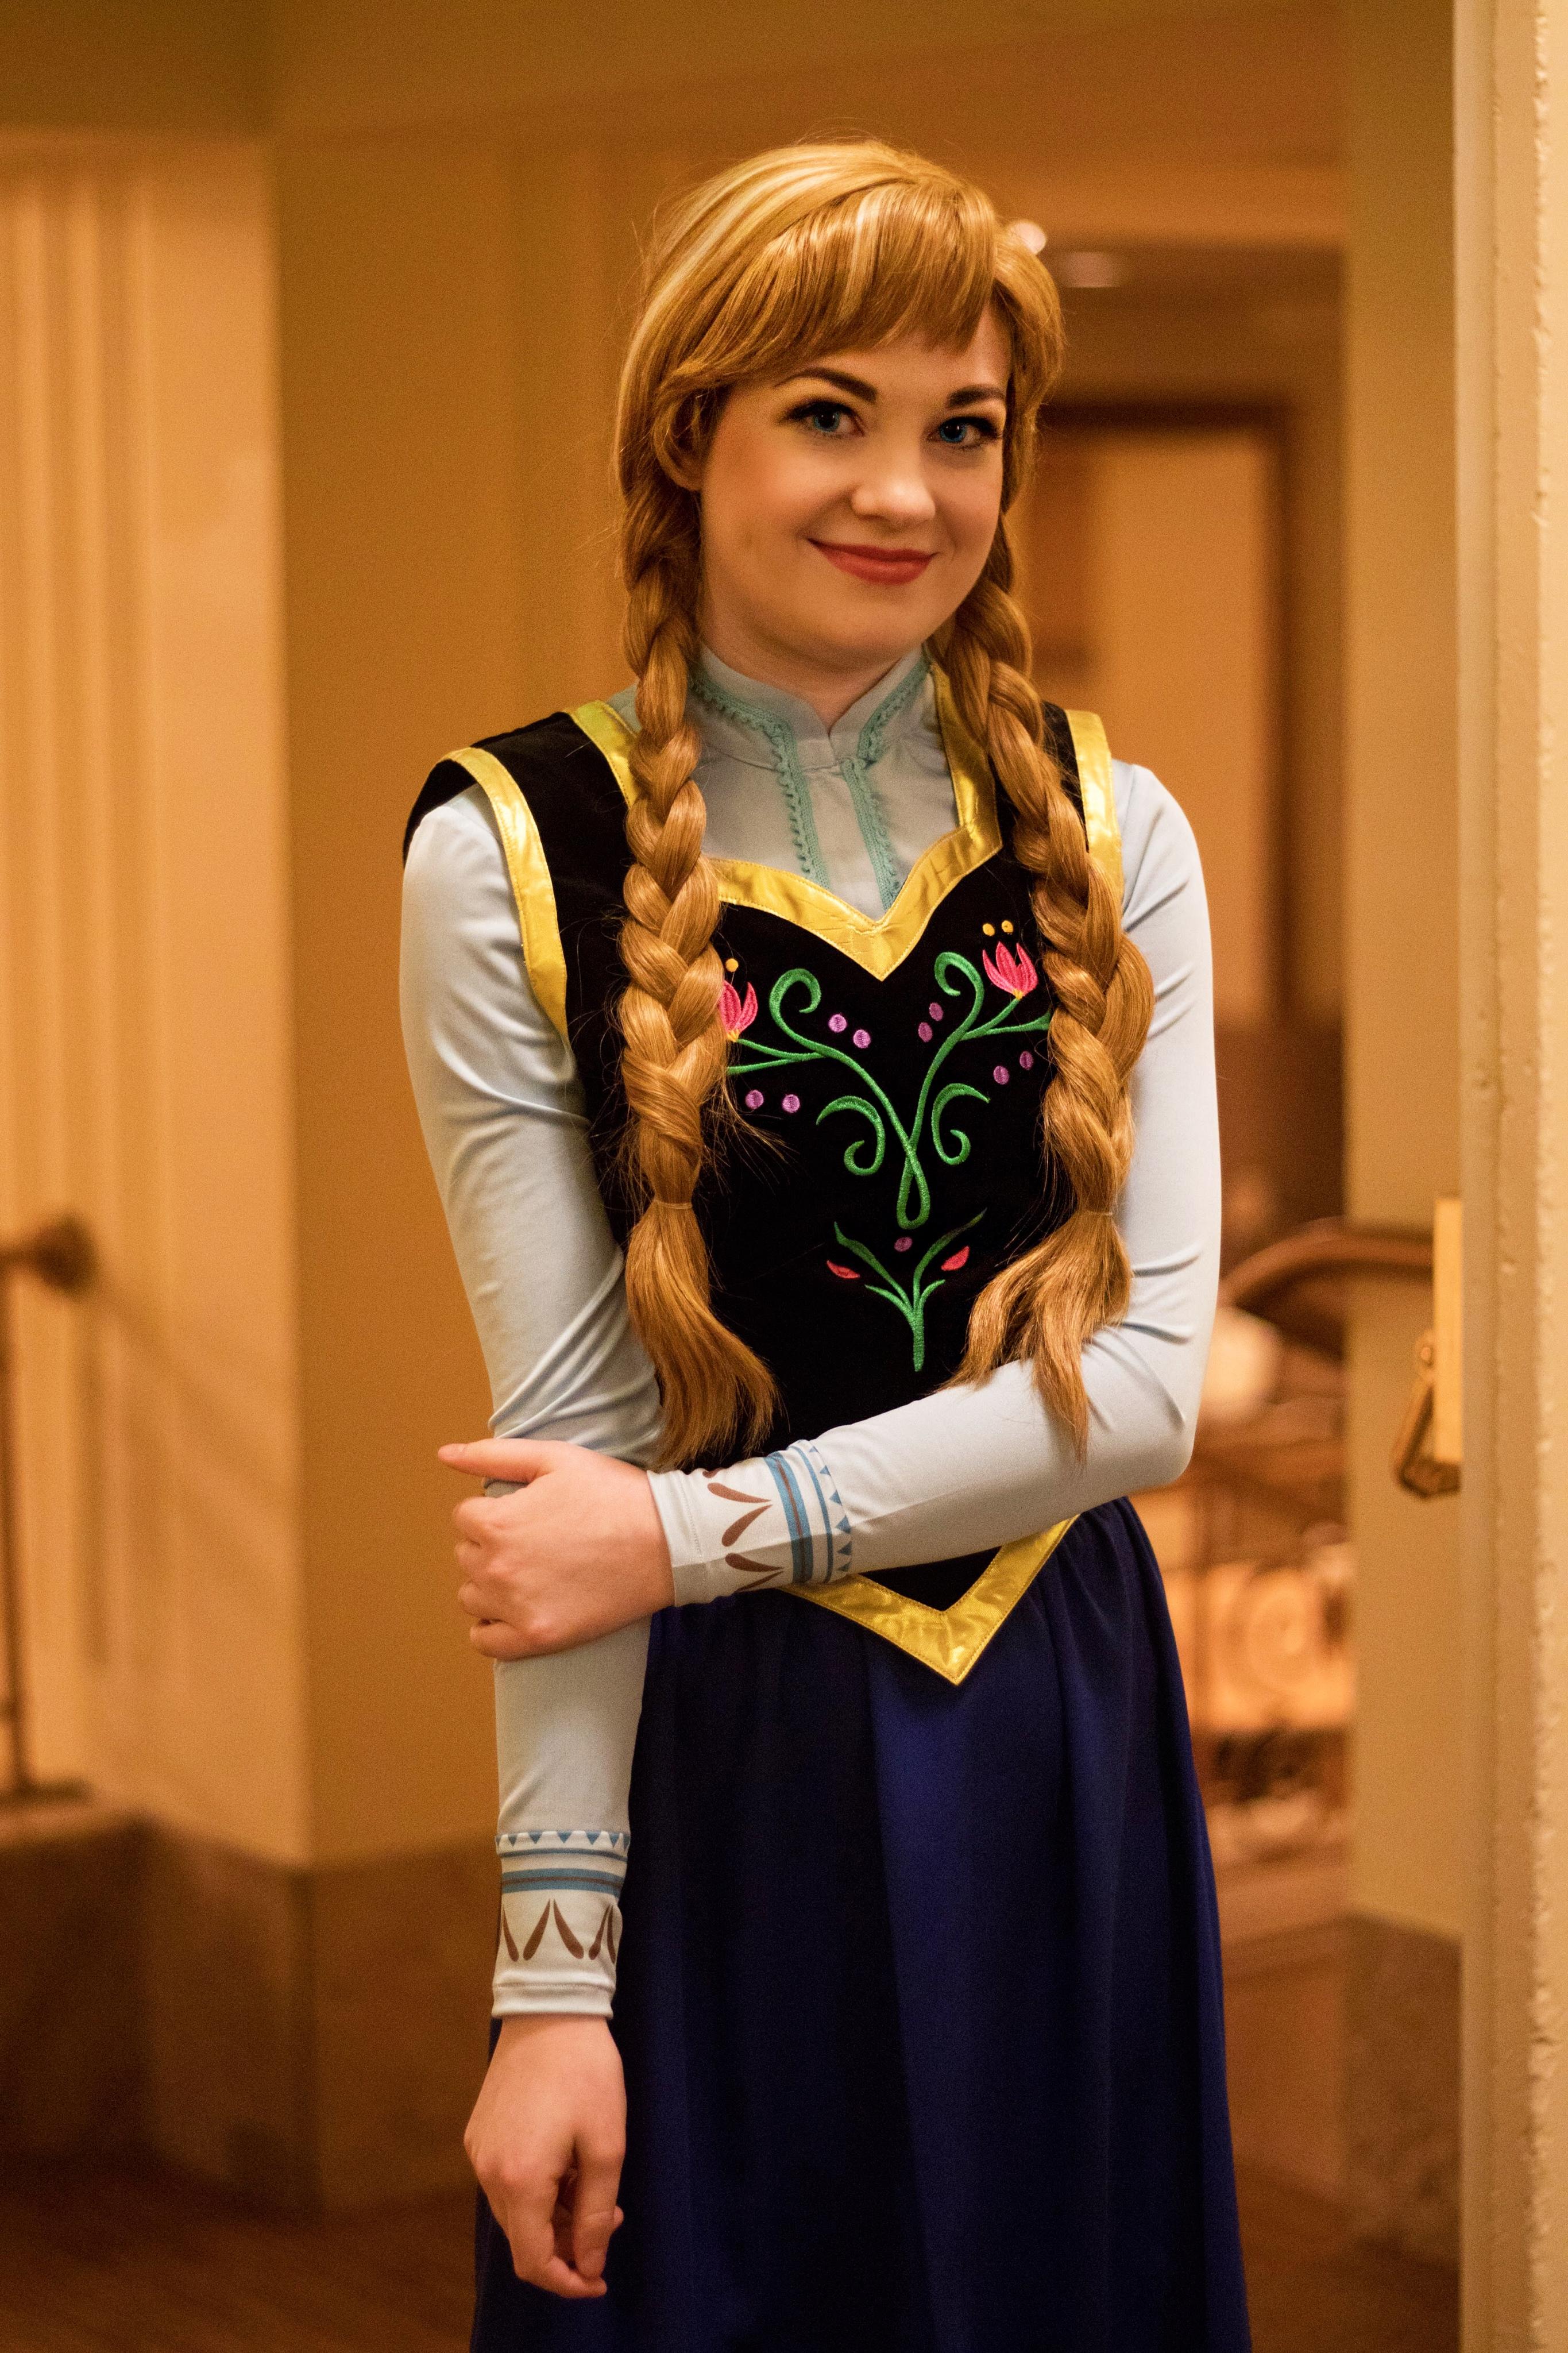 Snow Princess - Traveling Dress